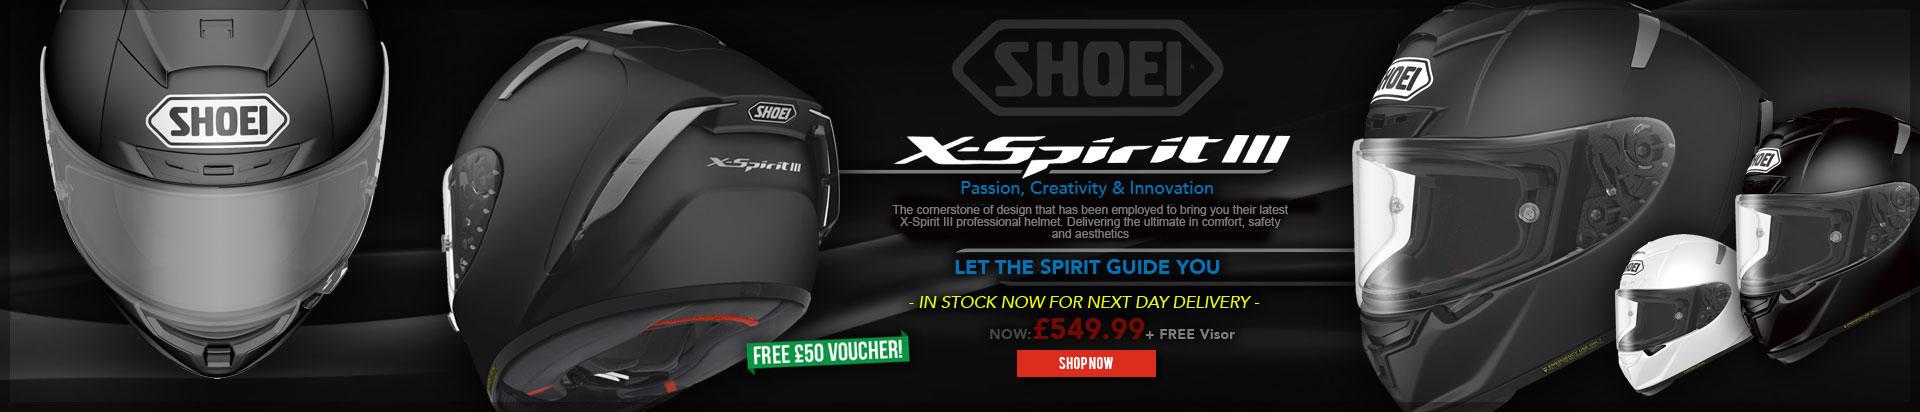 Shoei X-spirit 3 Helmets